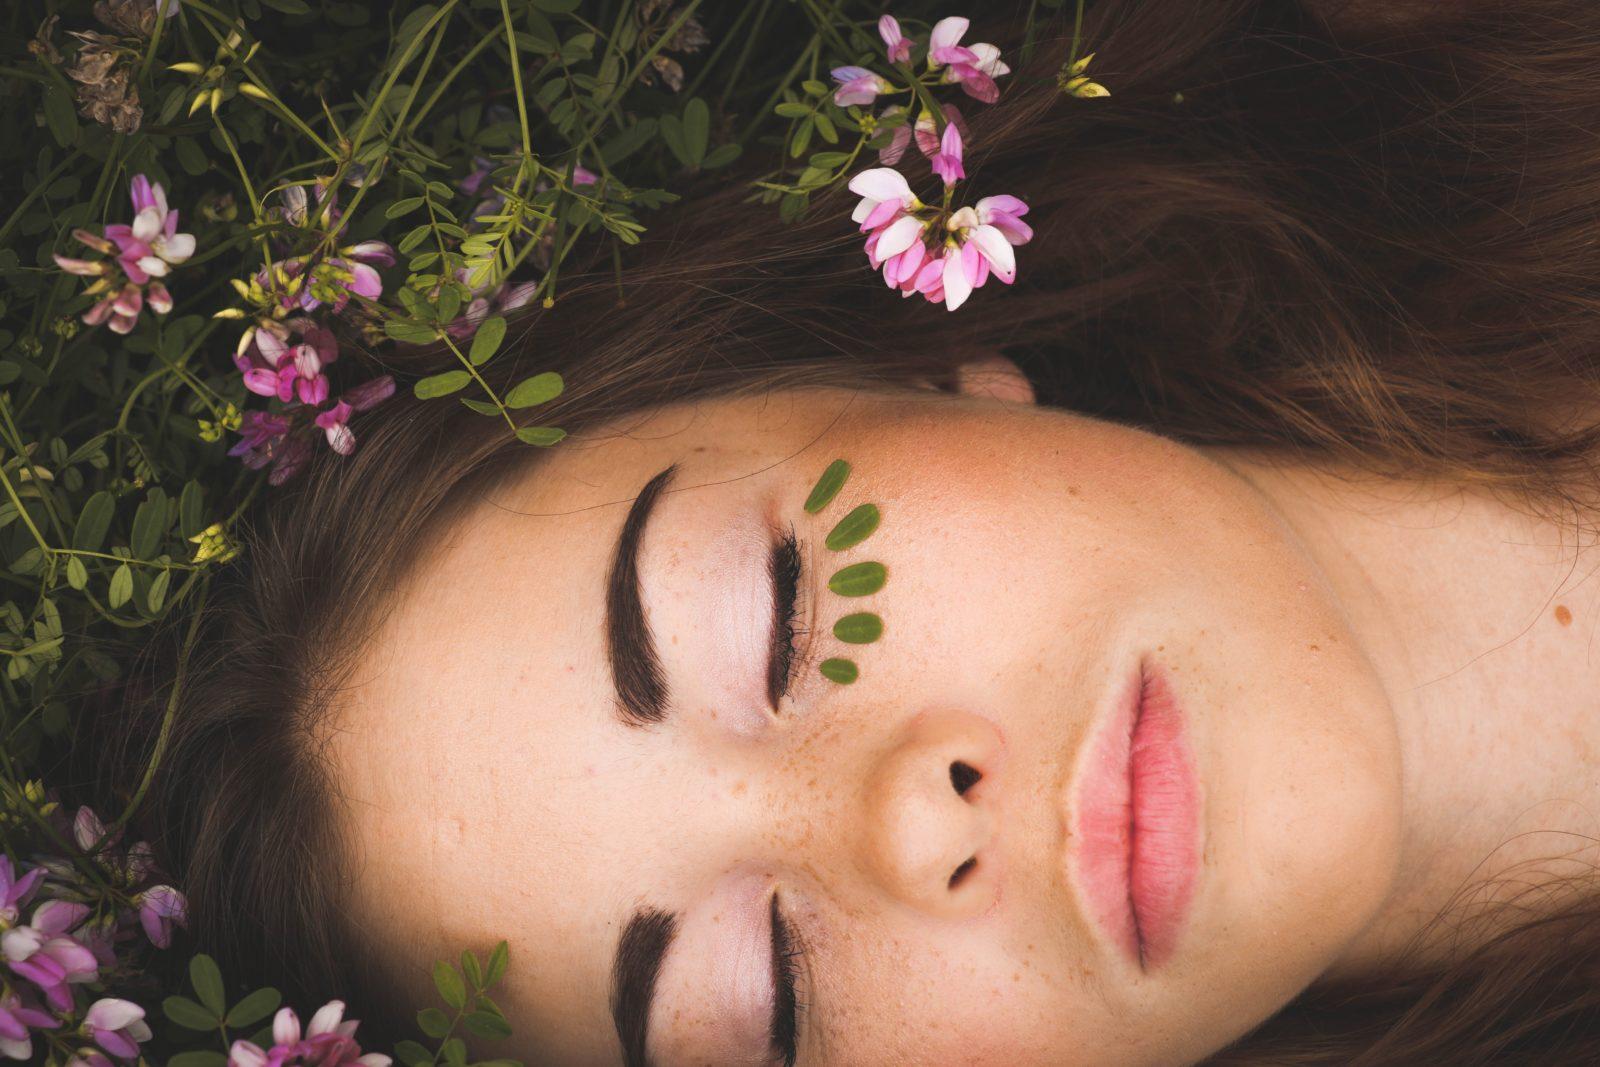 Glycolic facial treatment